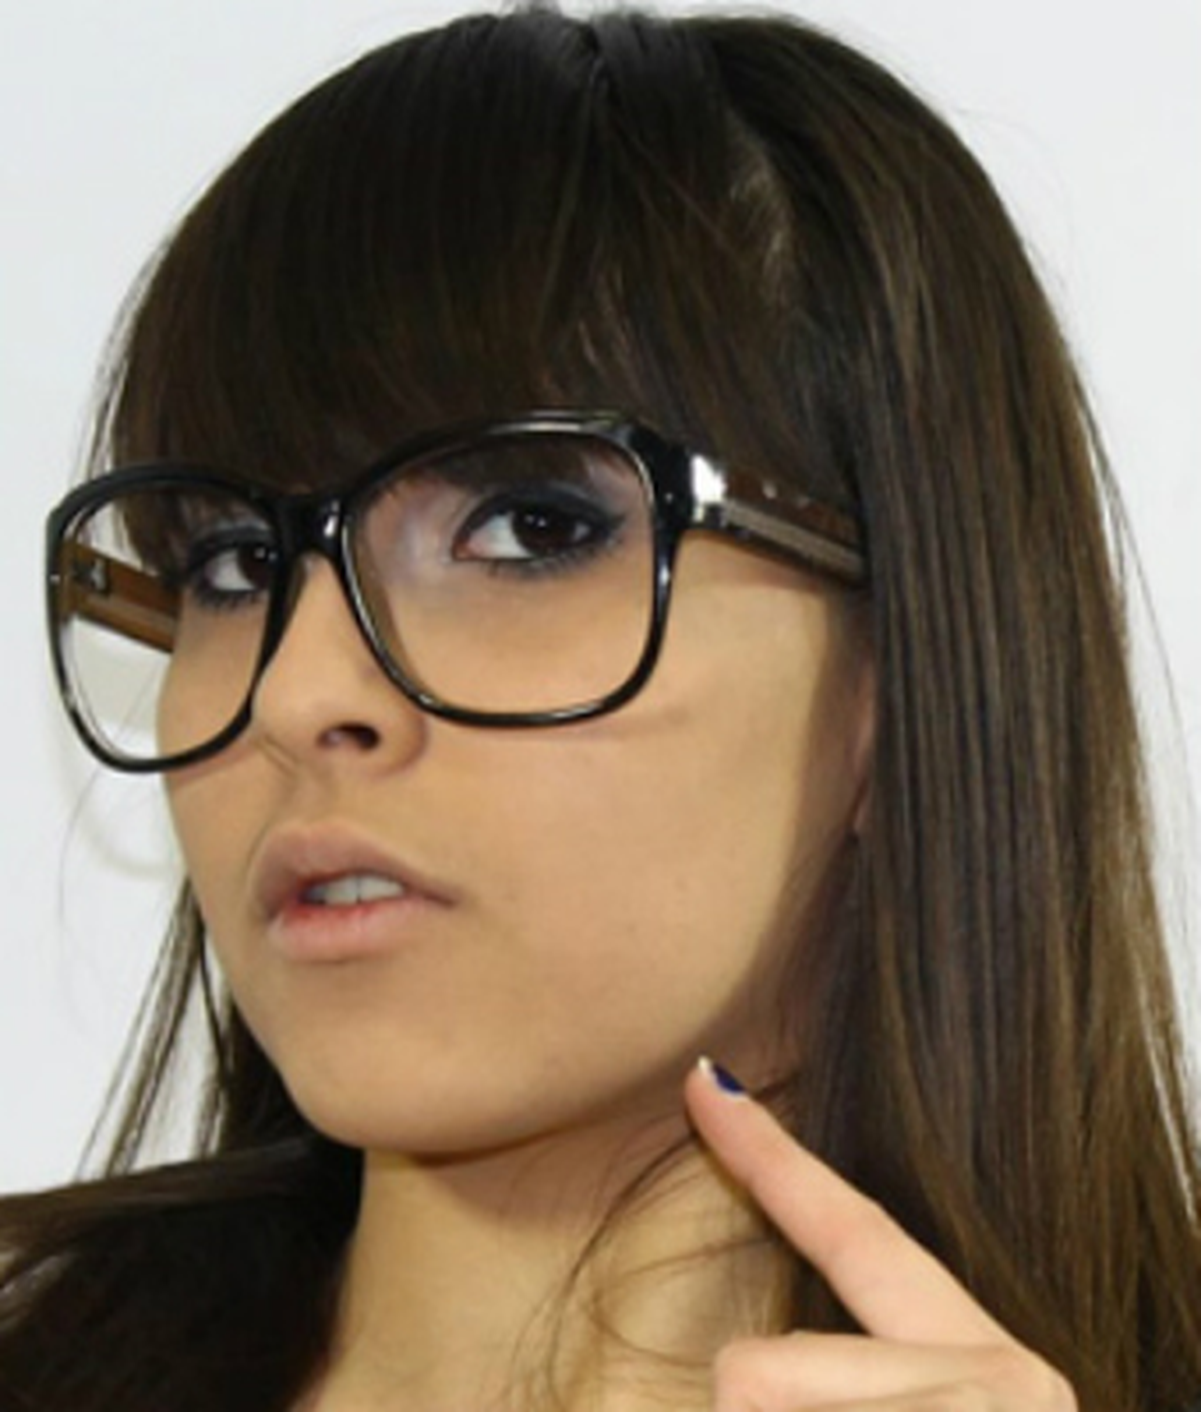 Nikki Litte